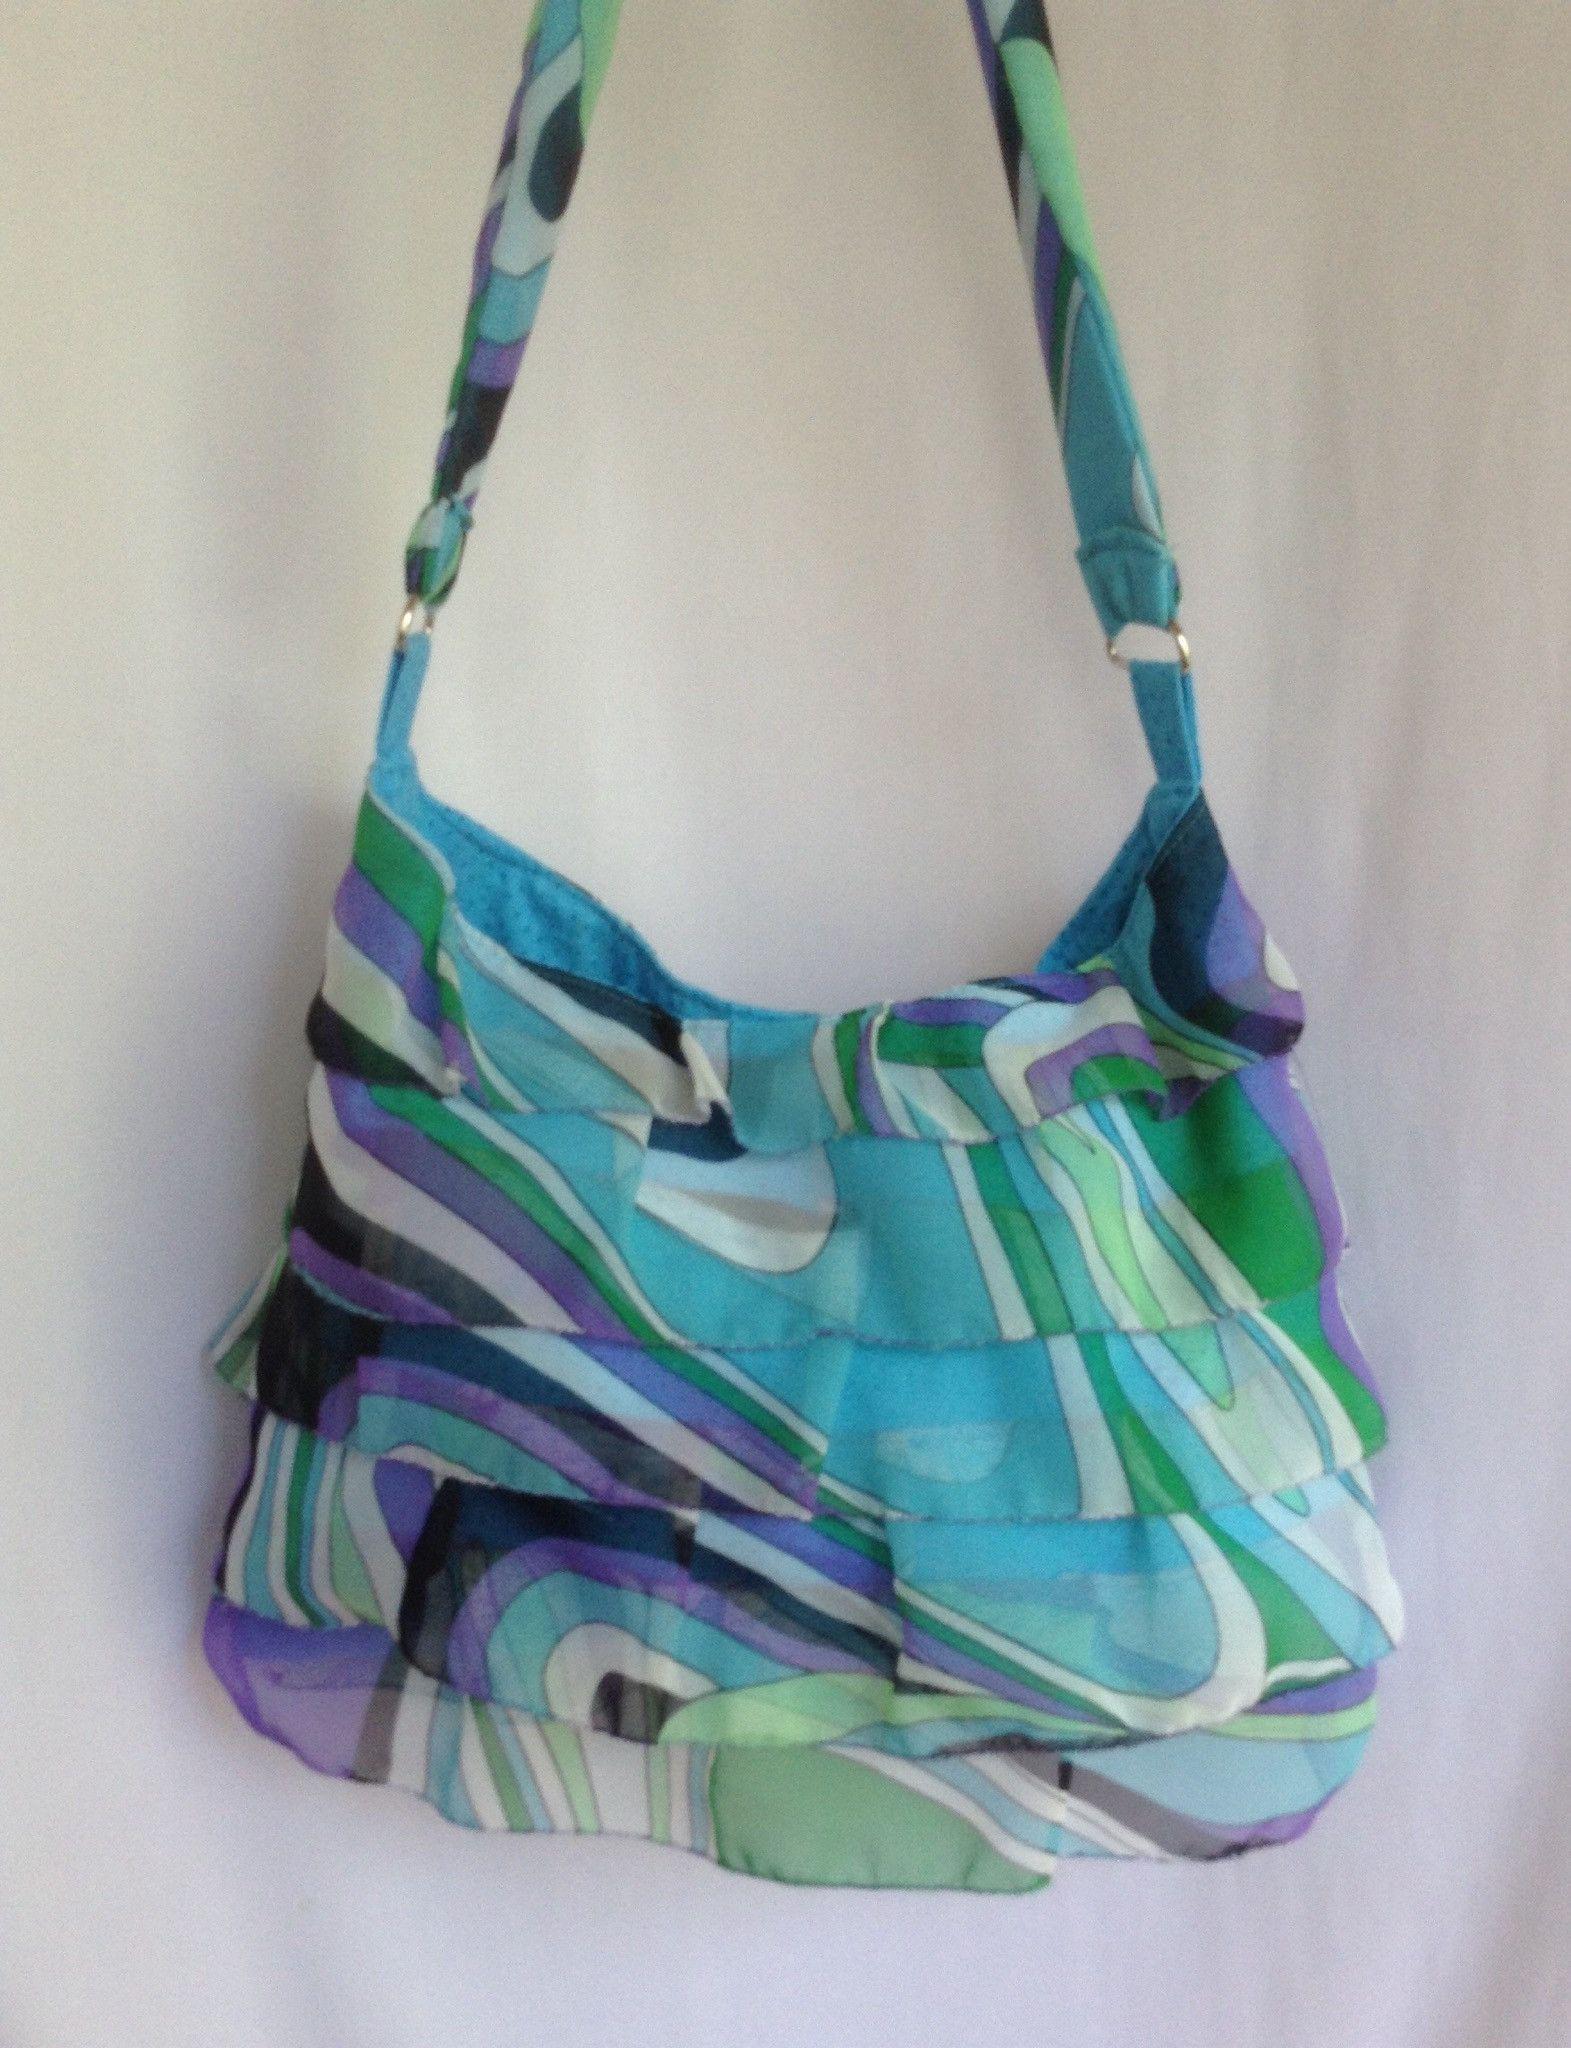 Blue Groovy Ruffle Hobo Bag